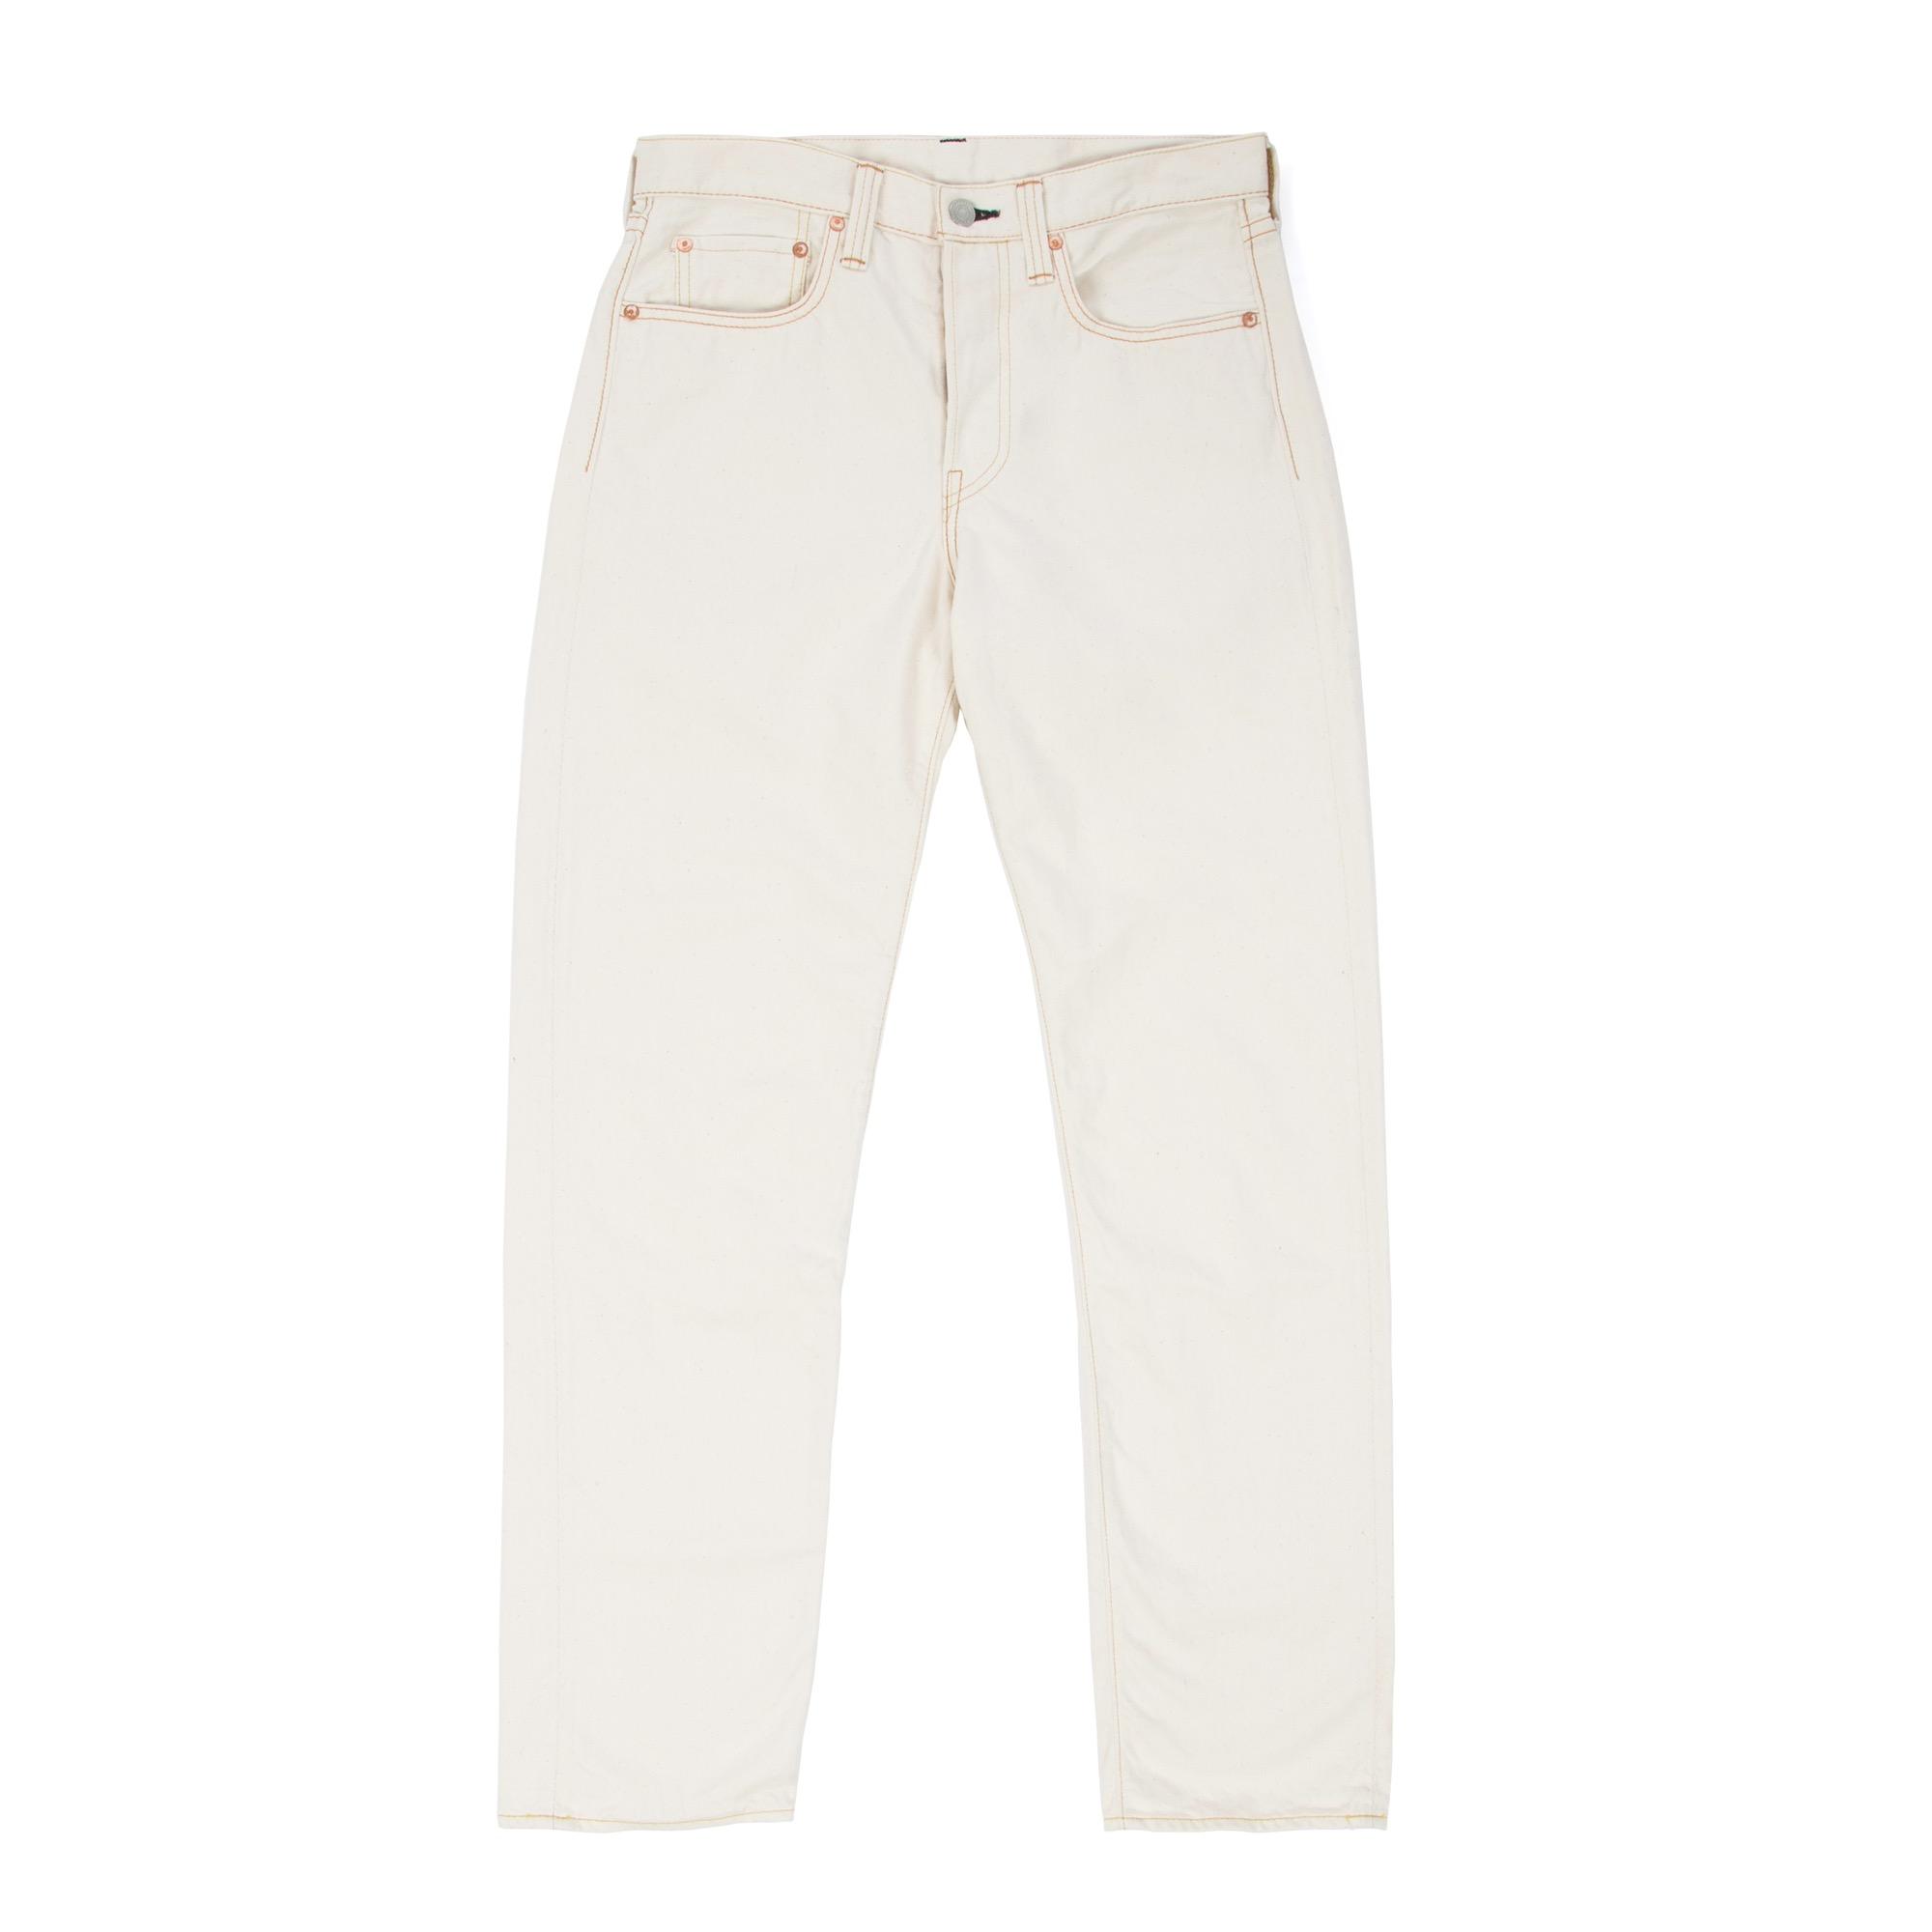 Fullcount x Timothy Everest Ecru Jeans